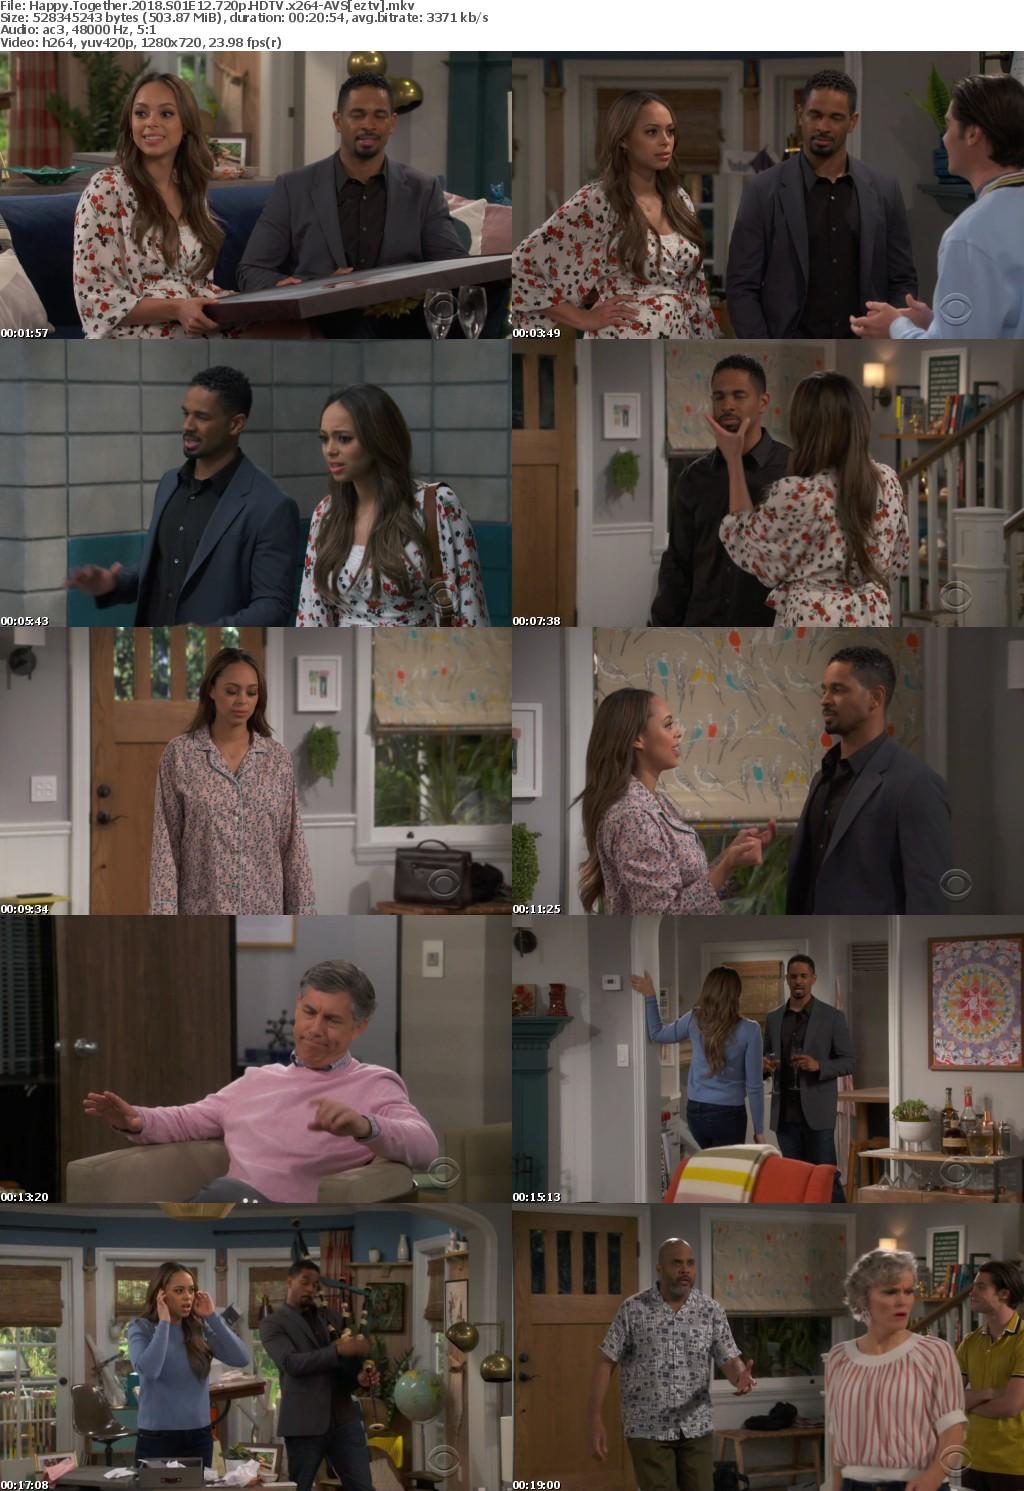 Happy Together (2018) S01E12 720p HDTV x264-AVS